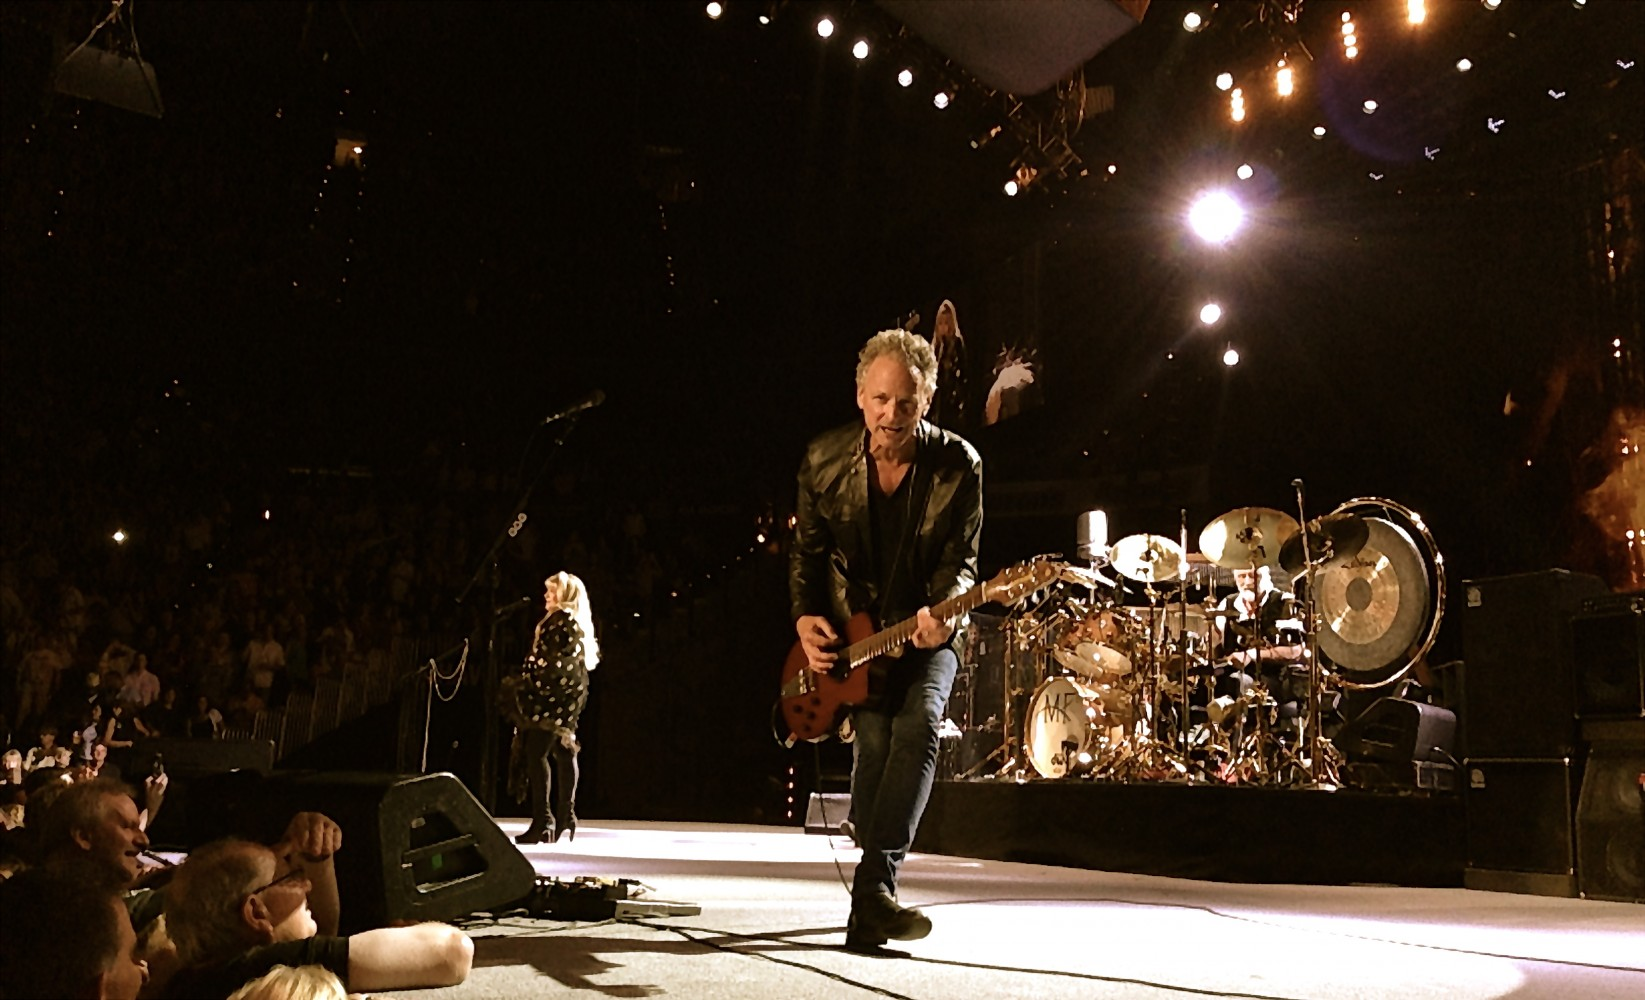 Fleetwood_Mac_live_in_Atlanta_2013 (1)